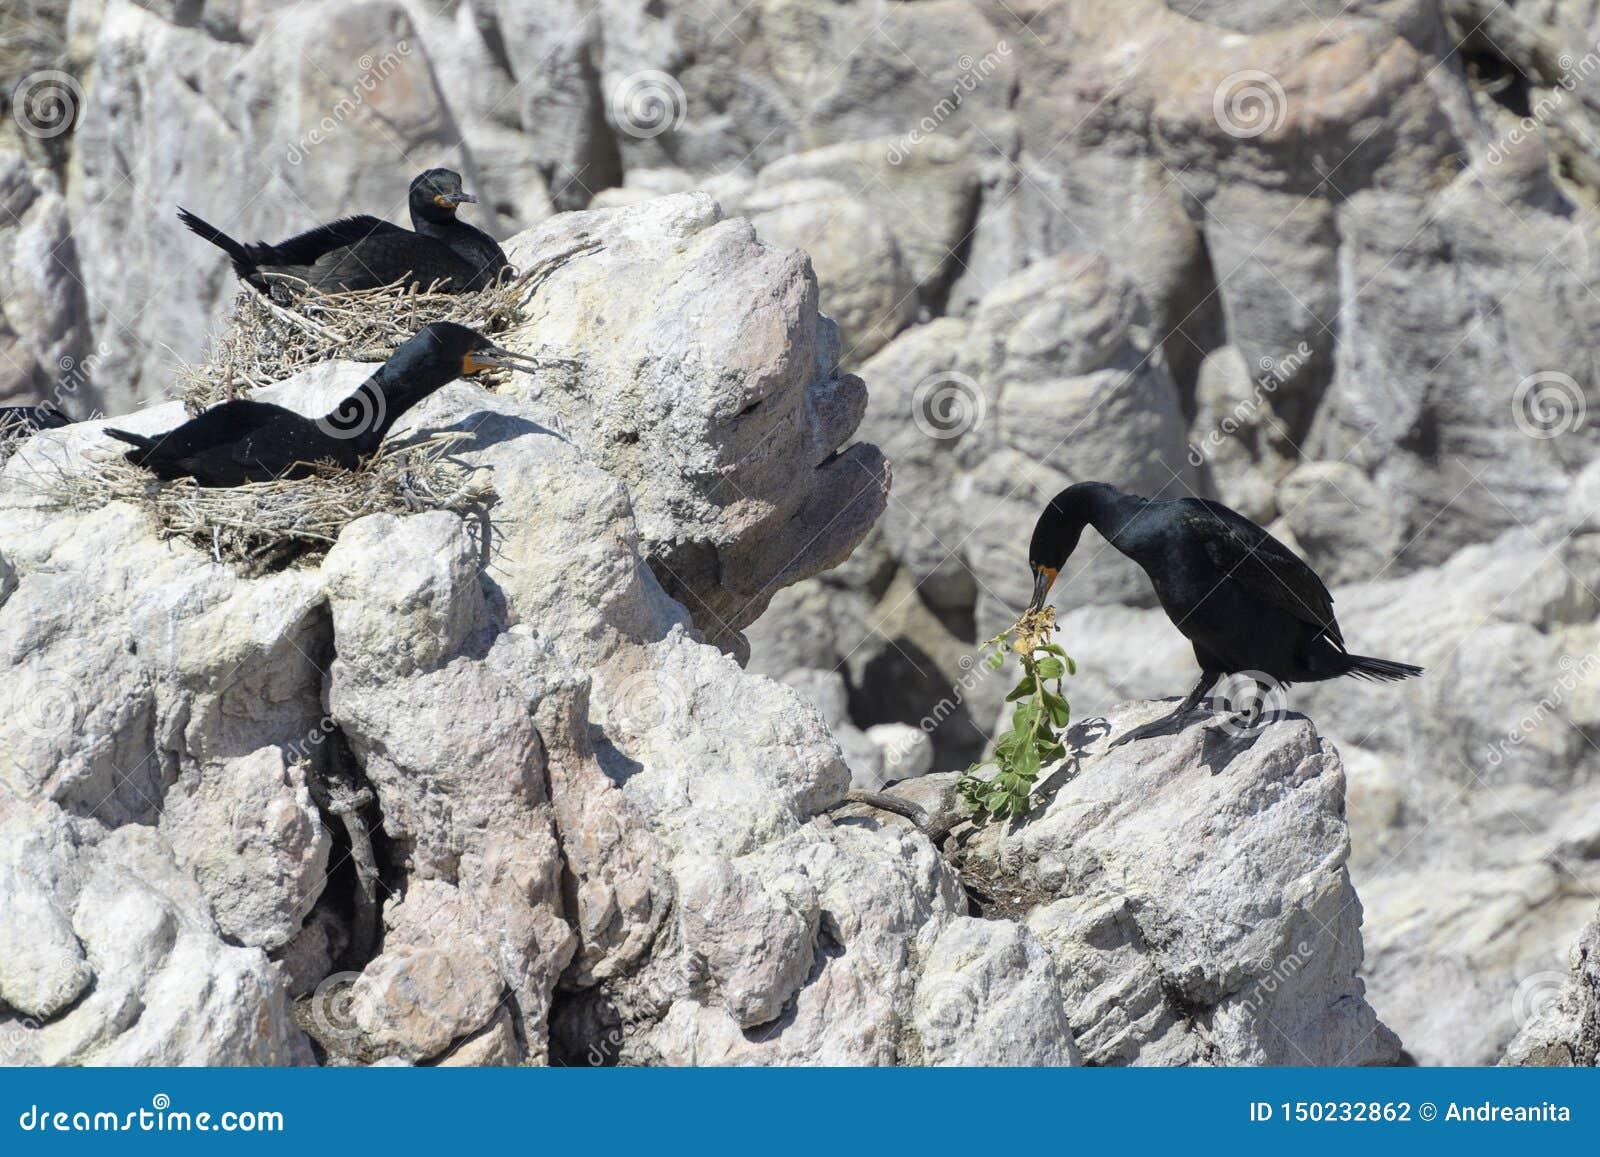 Cape Cormorants nesting on cliff